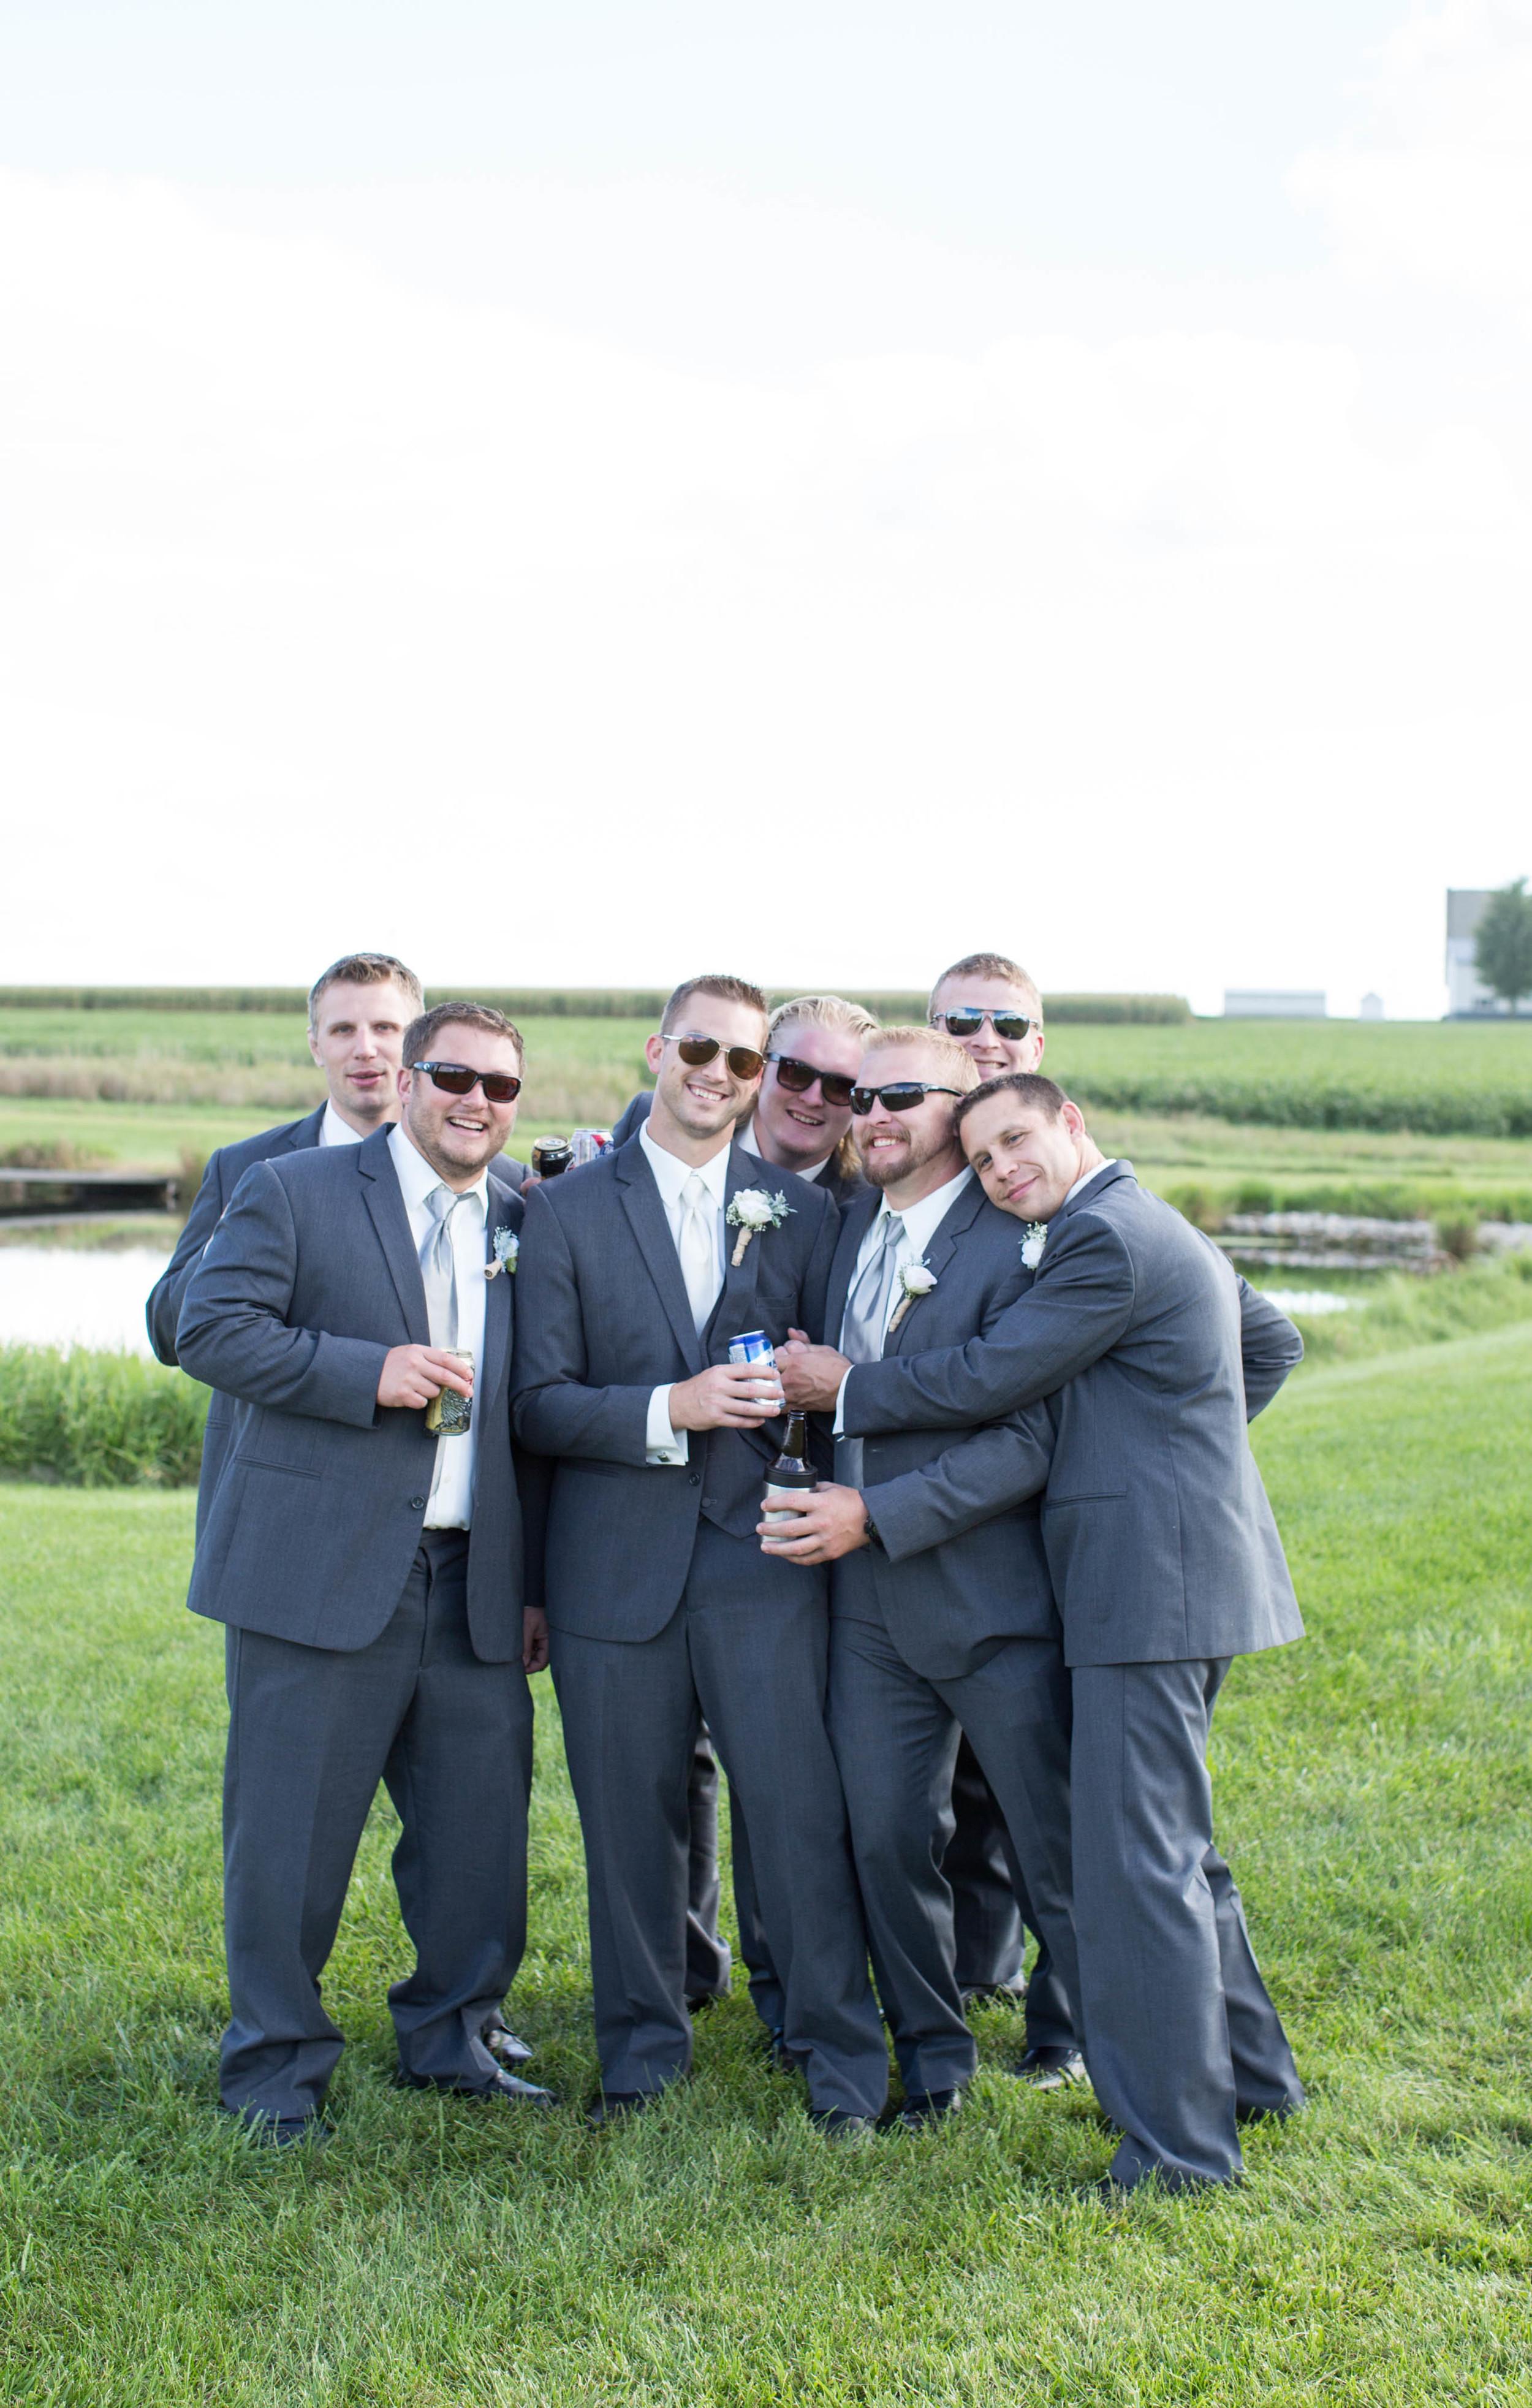 #mnwedding #mnphotographer #countrycharm  #groomsmen